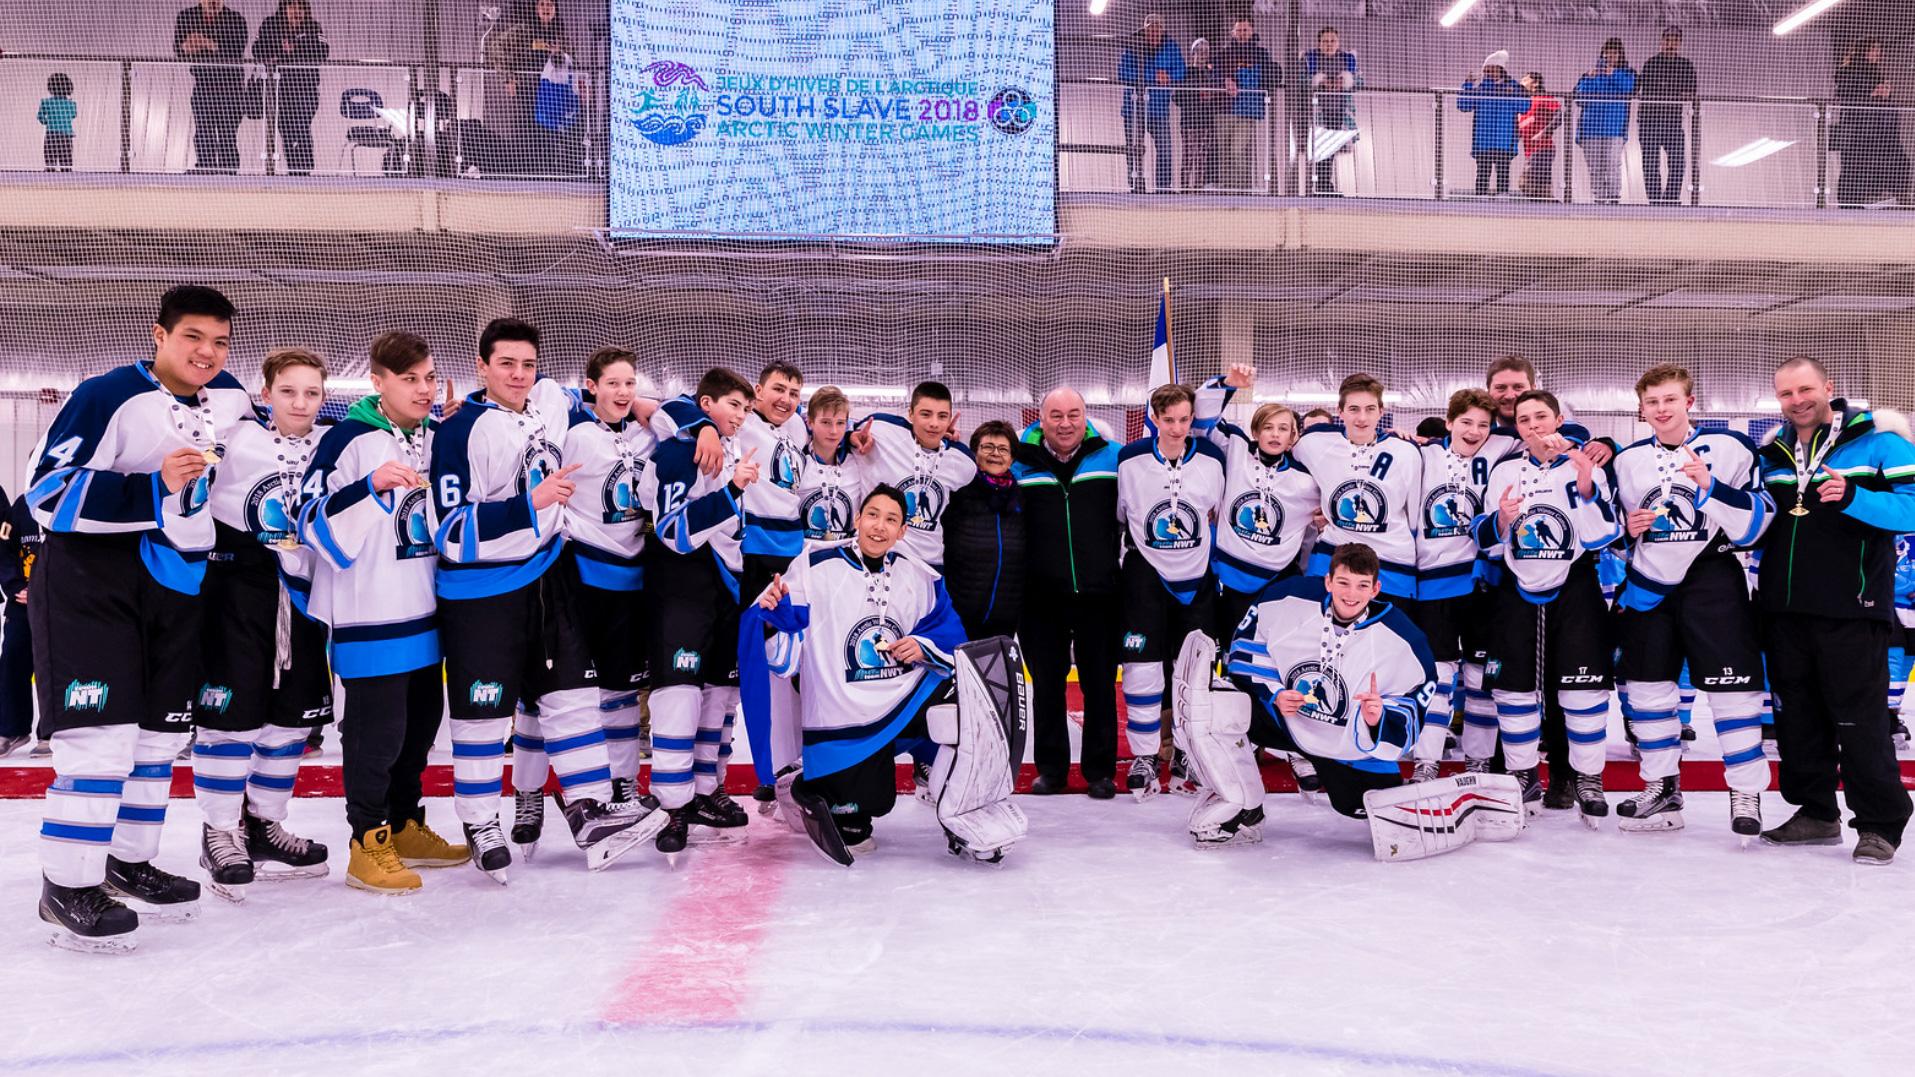 Team NT's bantam hockey players celebrate winning 2018 Arctic Winter Games gold with Premier Bob McLeod - AWG2018-Brian Collins-Landwash Studios